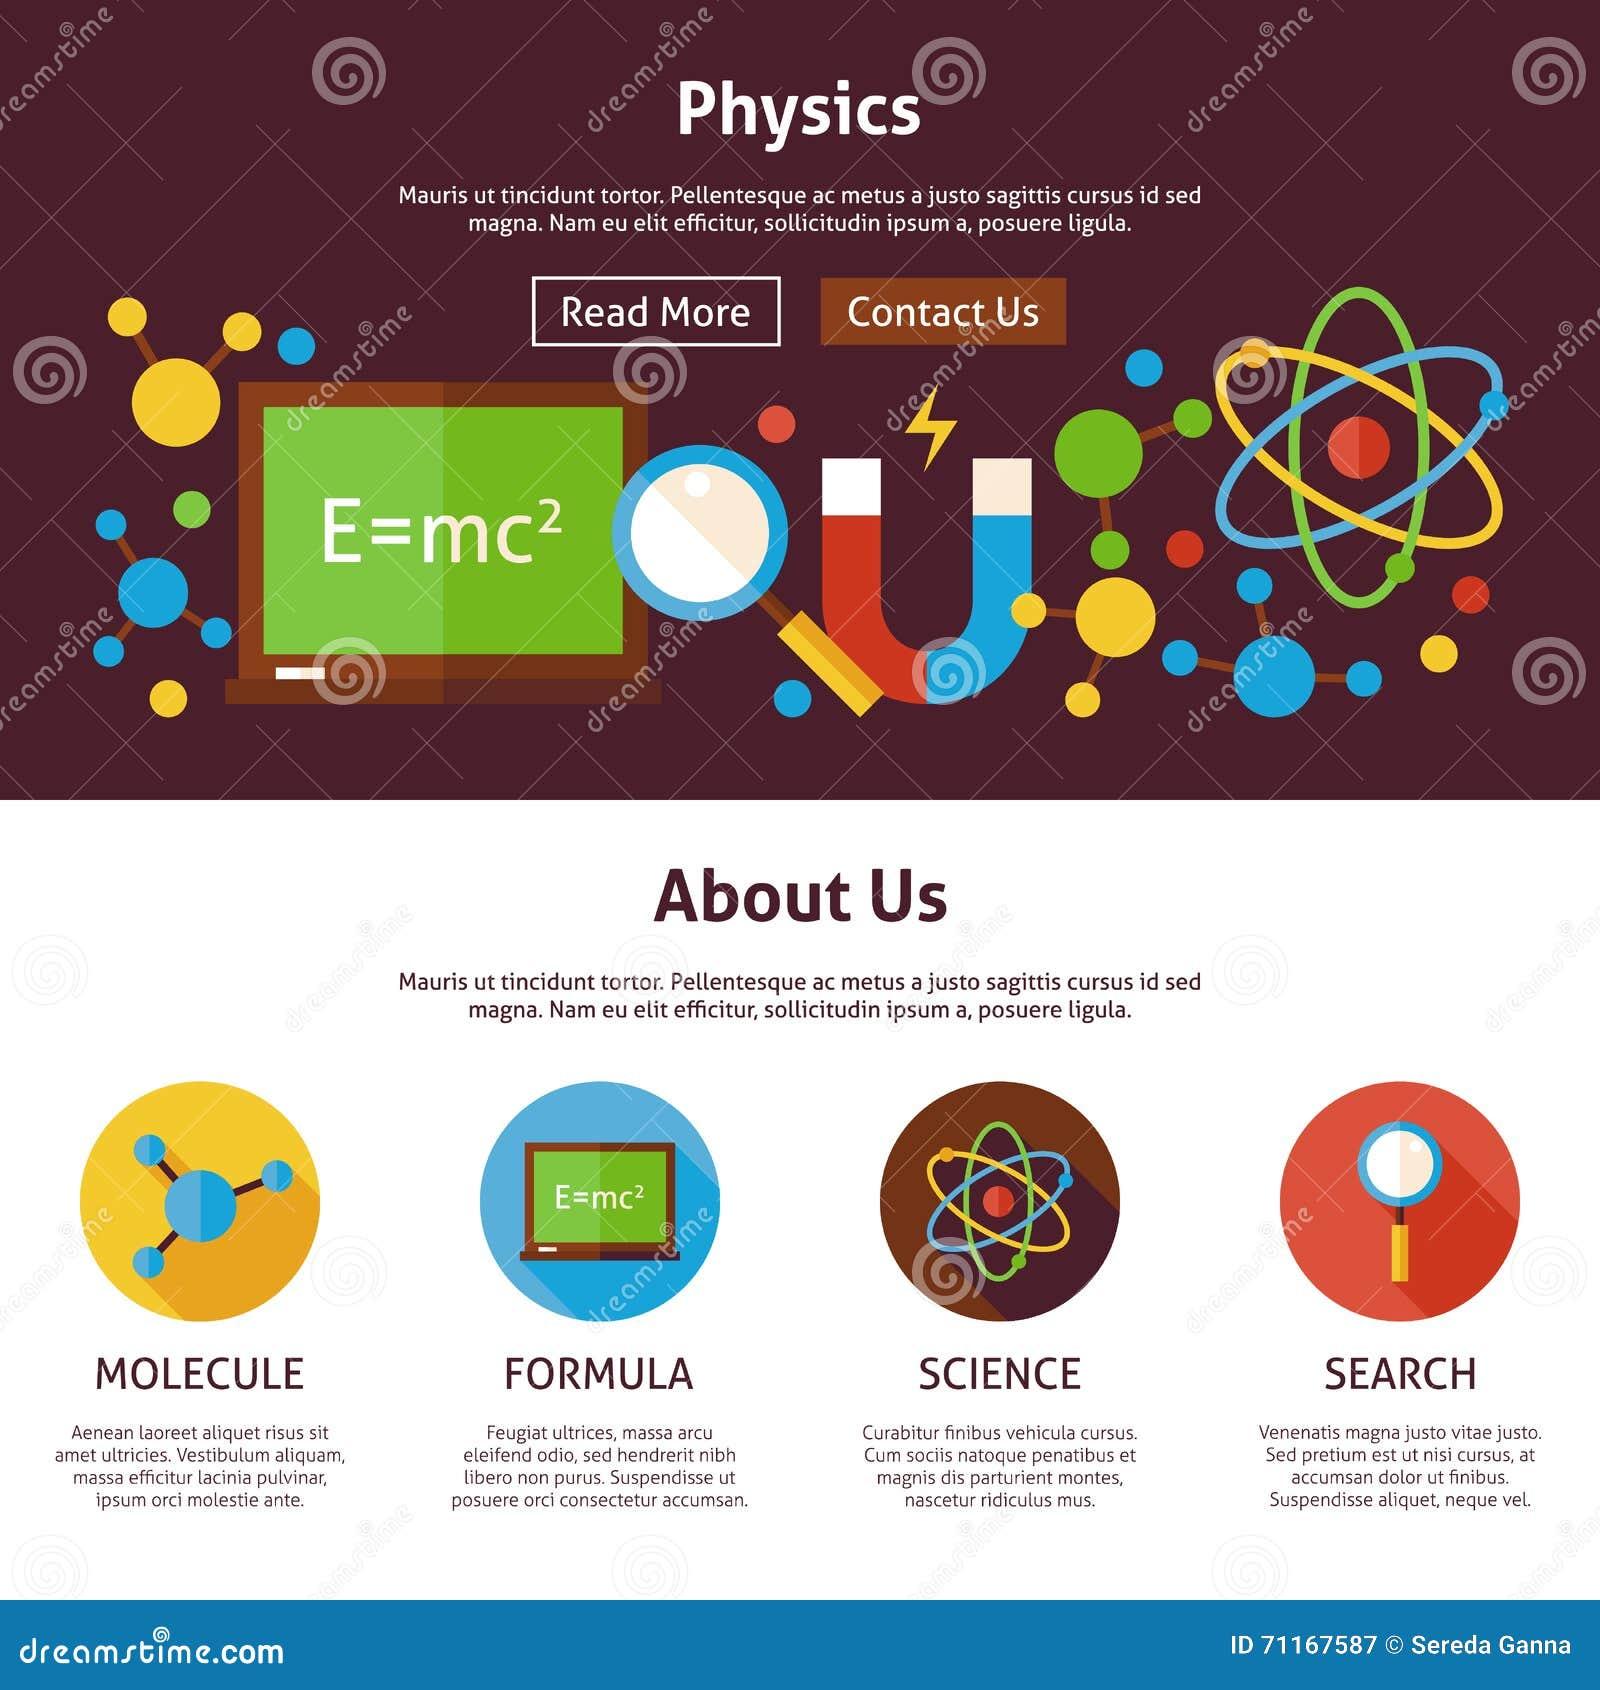 Vector Illustration Web Designs: Physics Science Flat Web Design Template Stock Vector